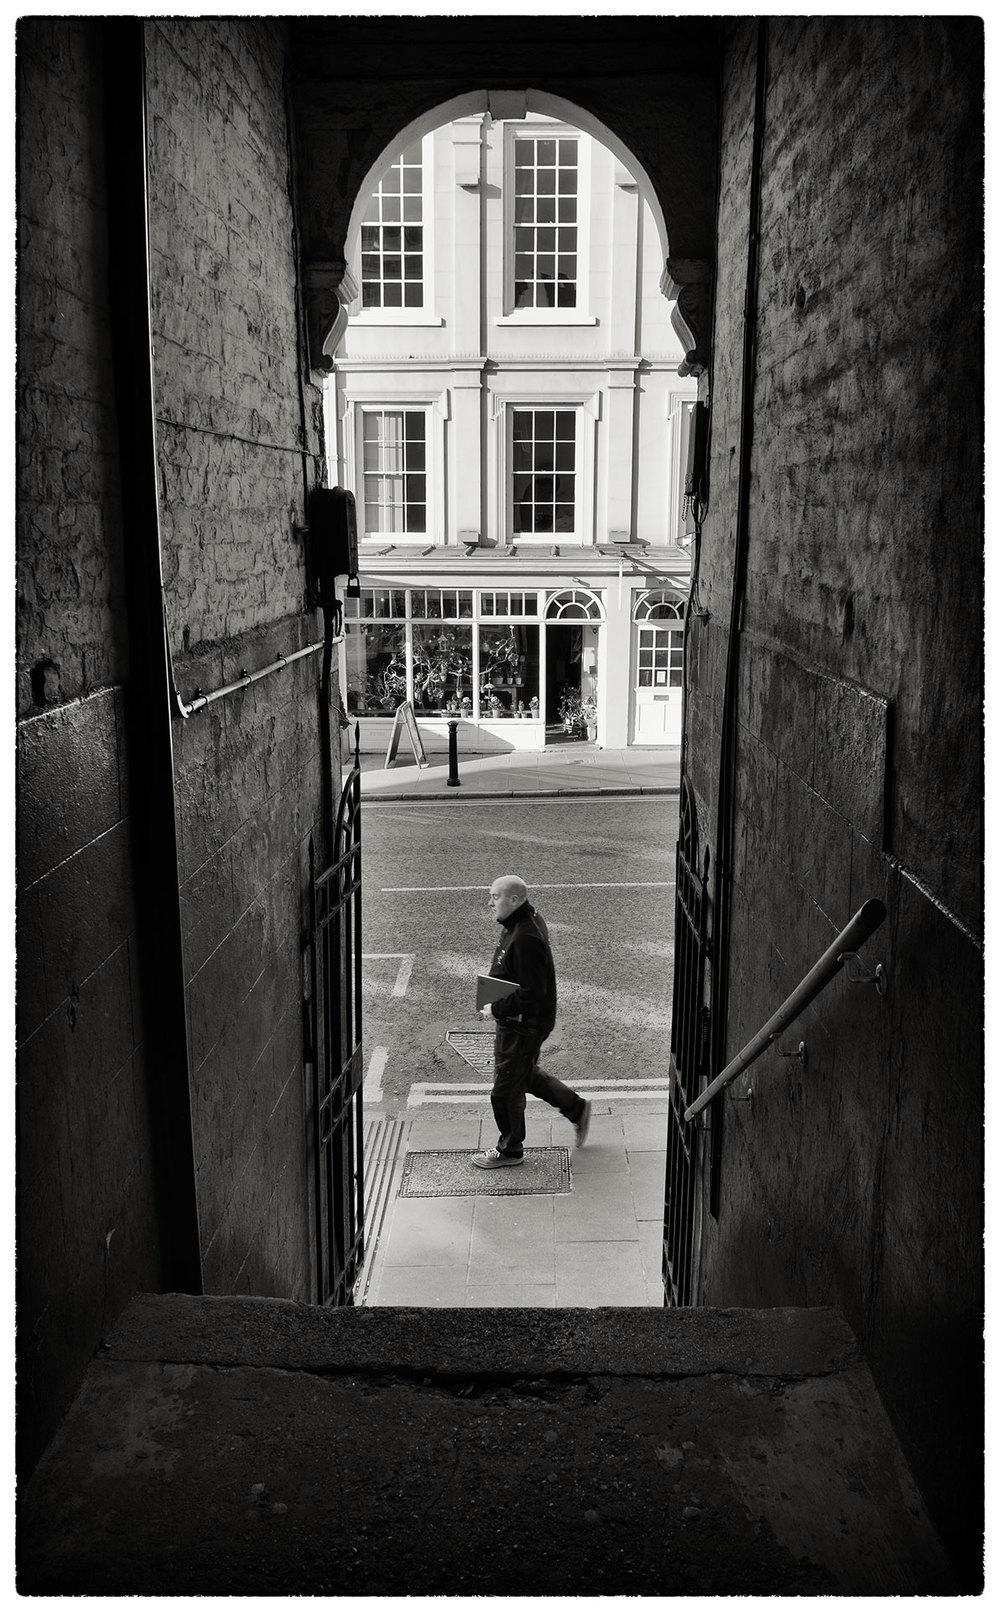 Passageway leading onto Lower Bridge Street, Chester, this morning.